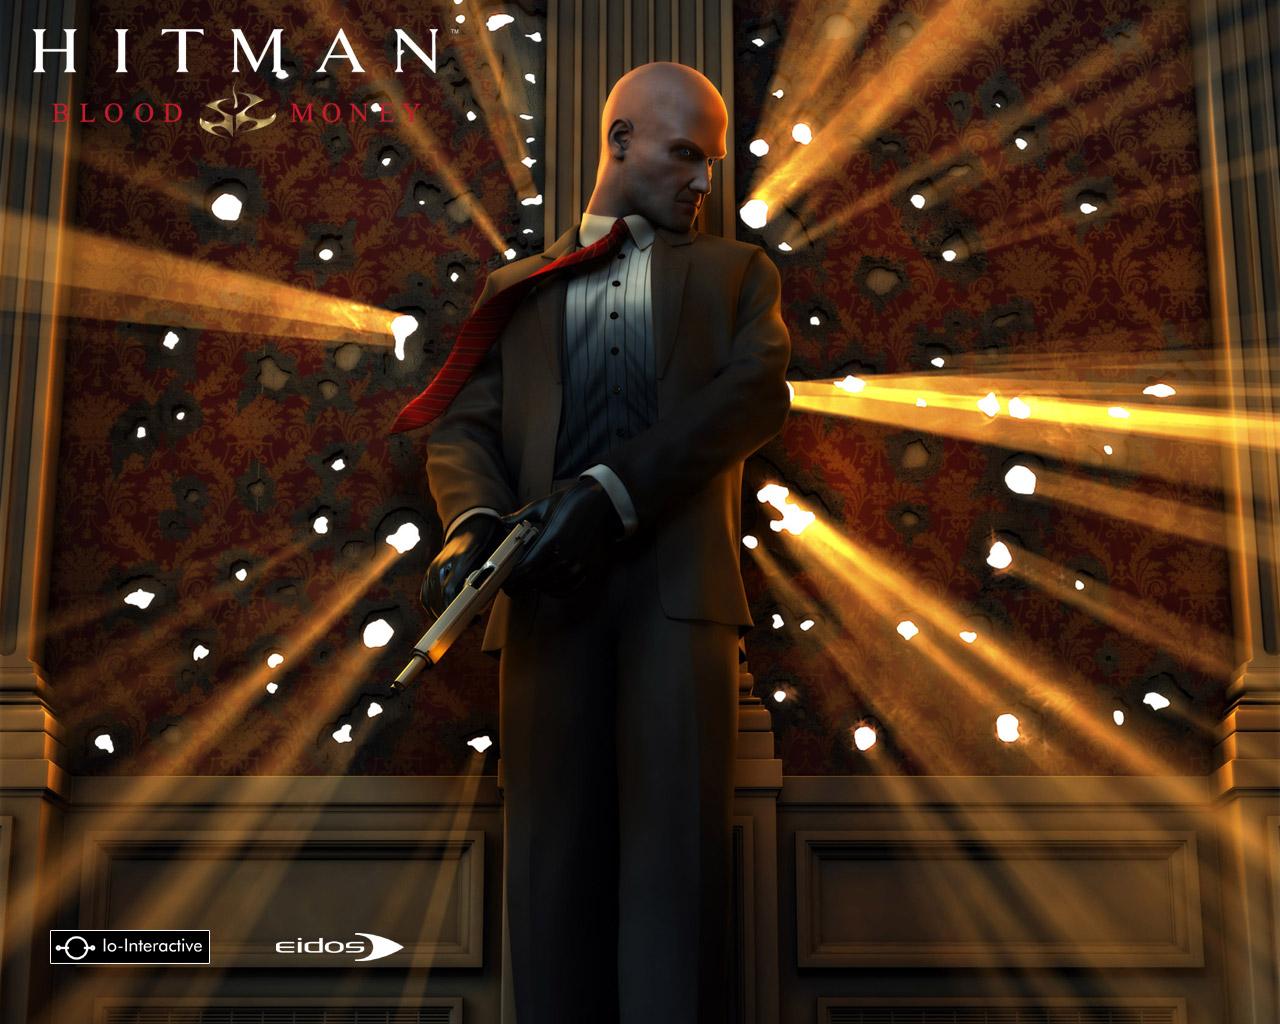 hitman-blood-money-game-for-windowsxboxplaystation20.jpg